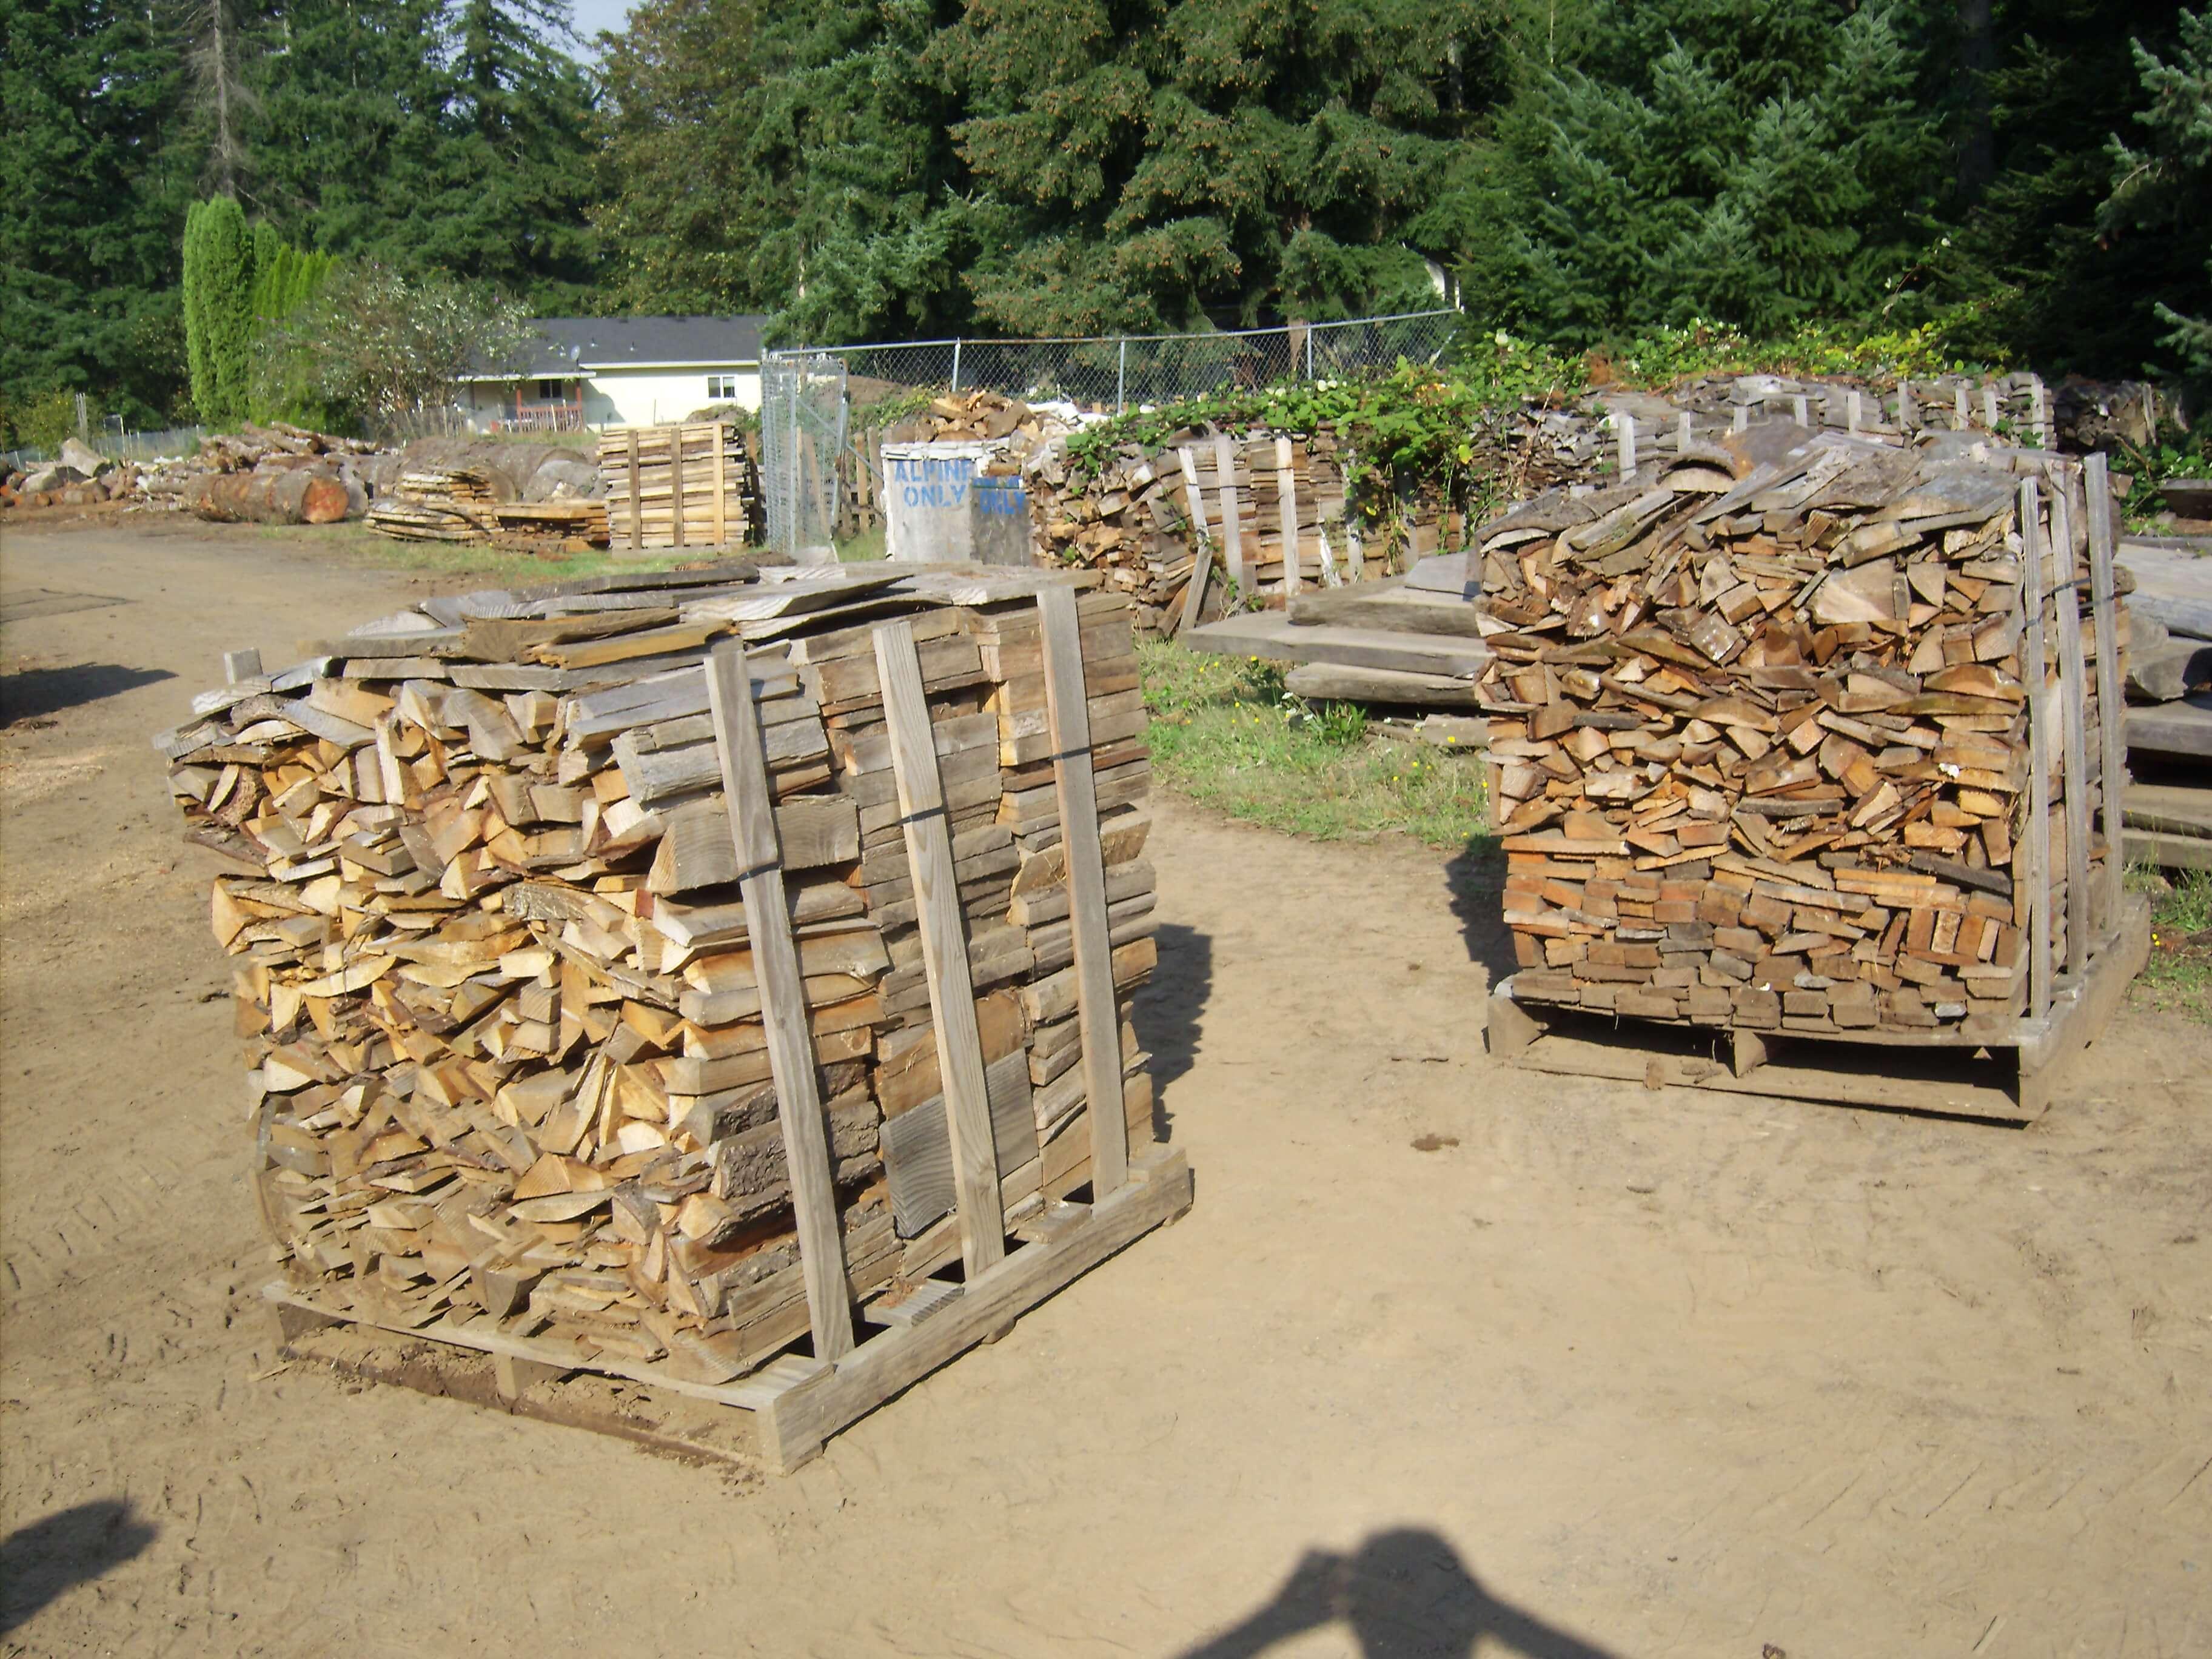 Firewood for sale in Camas, Washington: If you need ...